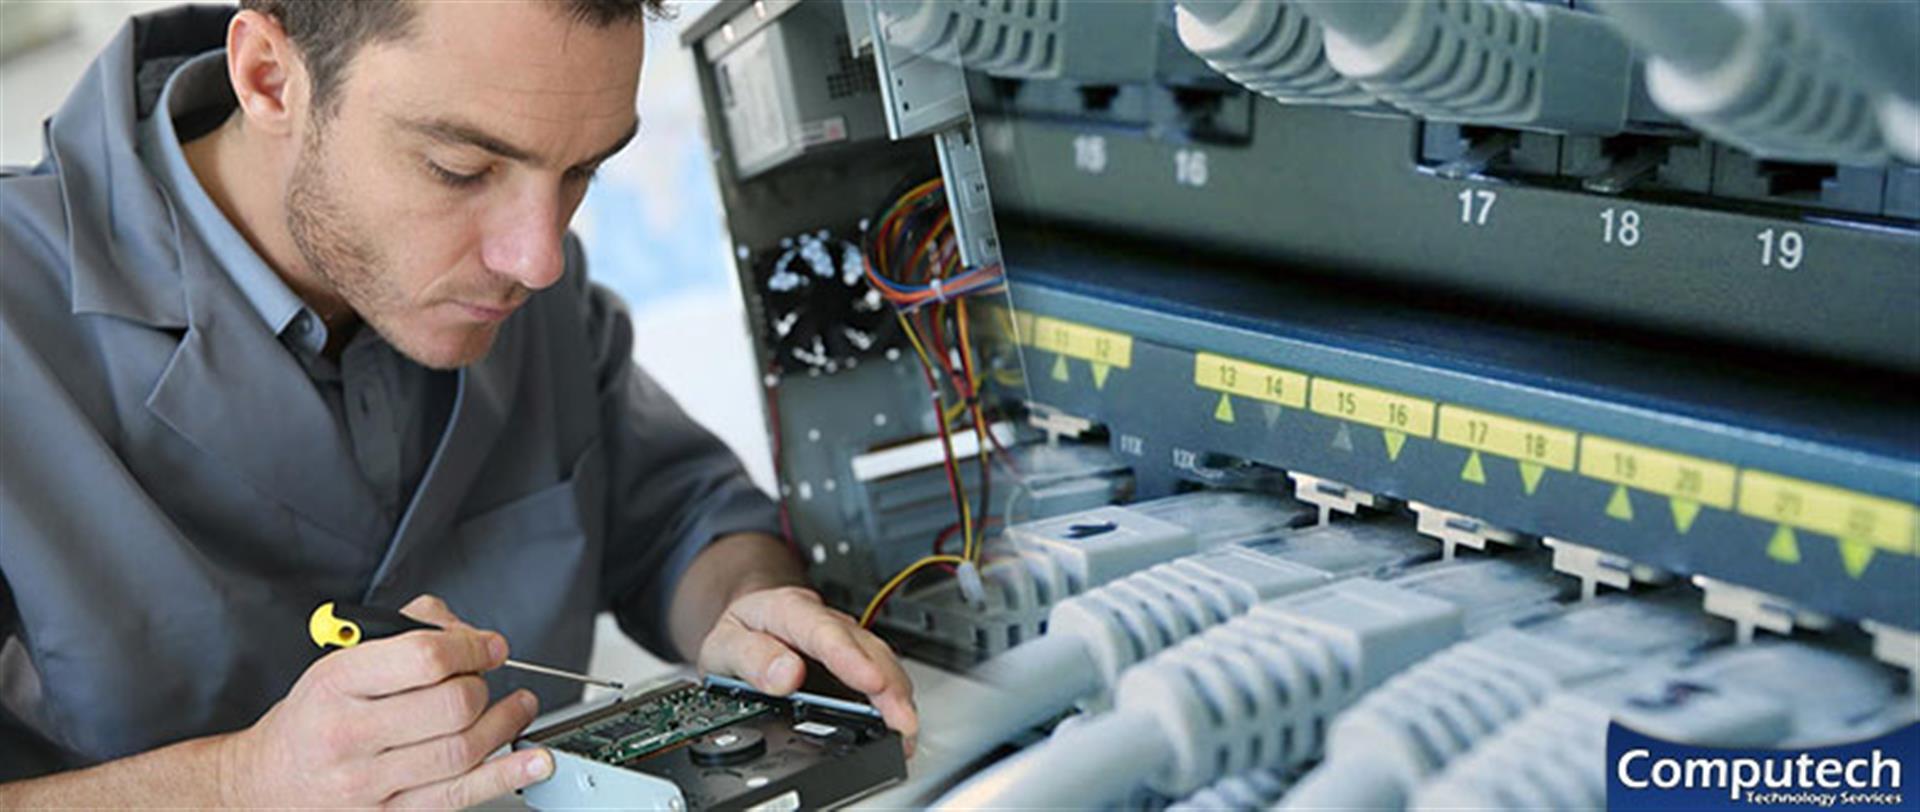 LaGrange Georgia On Site Computer & Printer Repair, Network, Voice & Data Cabling Solutions